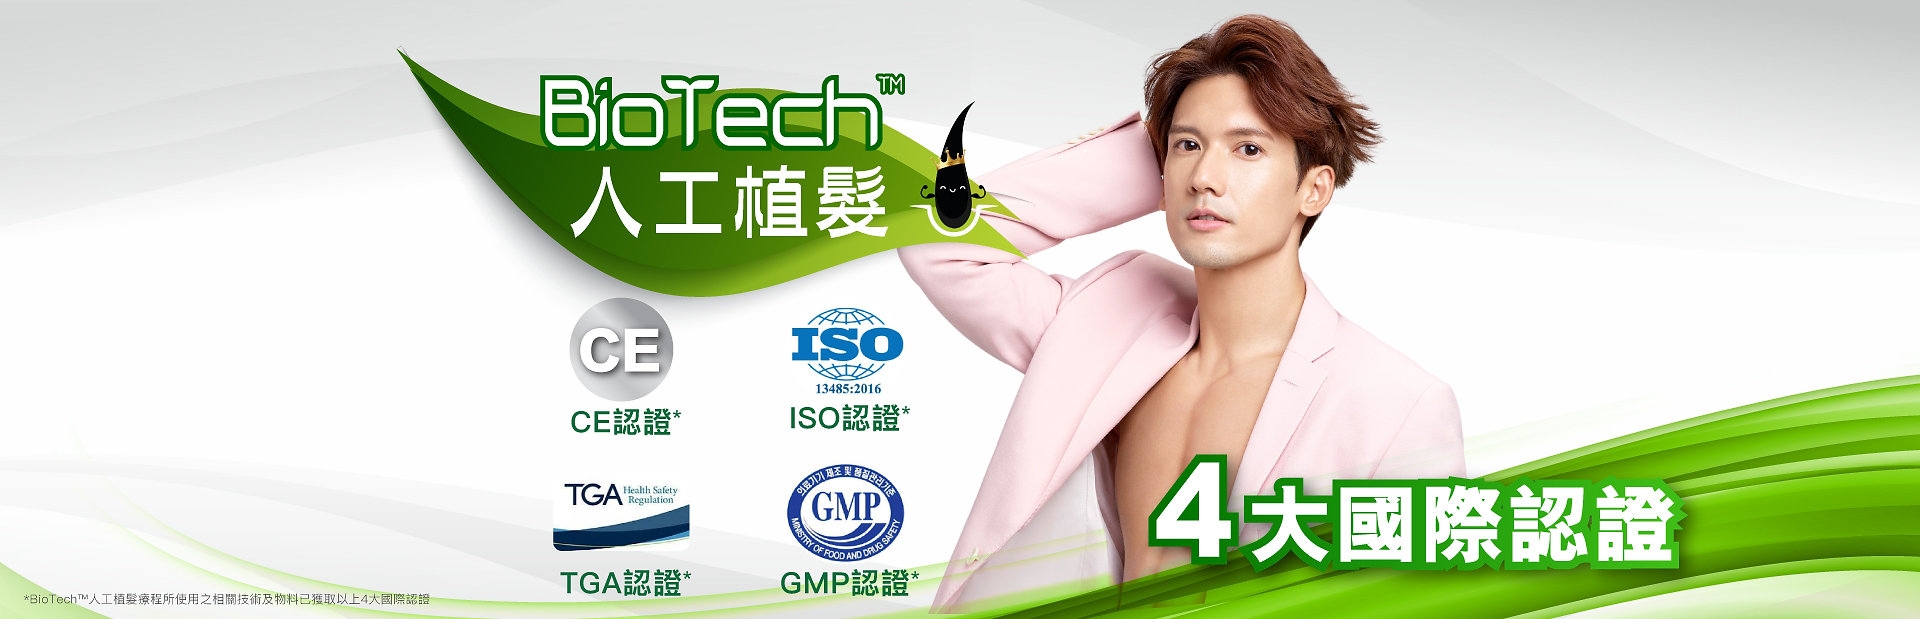 20211007_HAIR FOREST_Landing_BF人工植髮_desktop banner.jpg